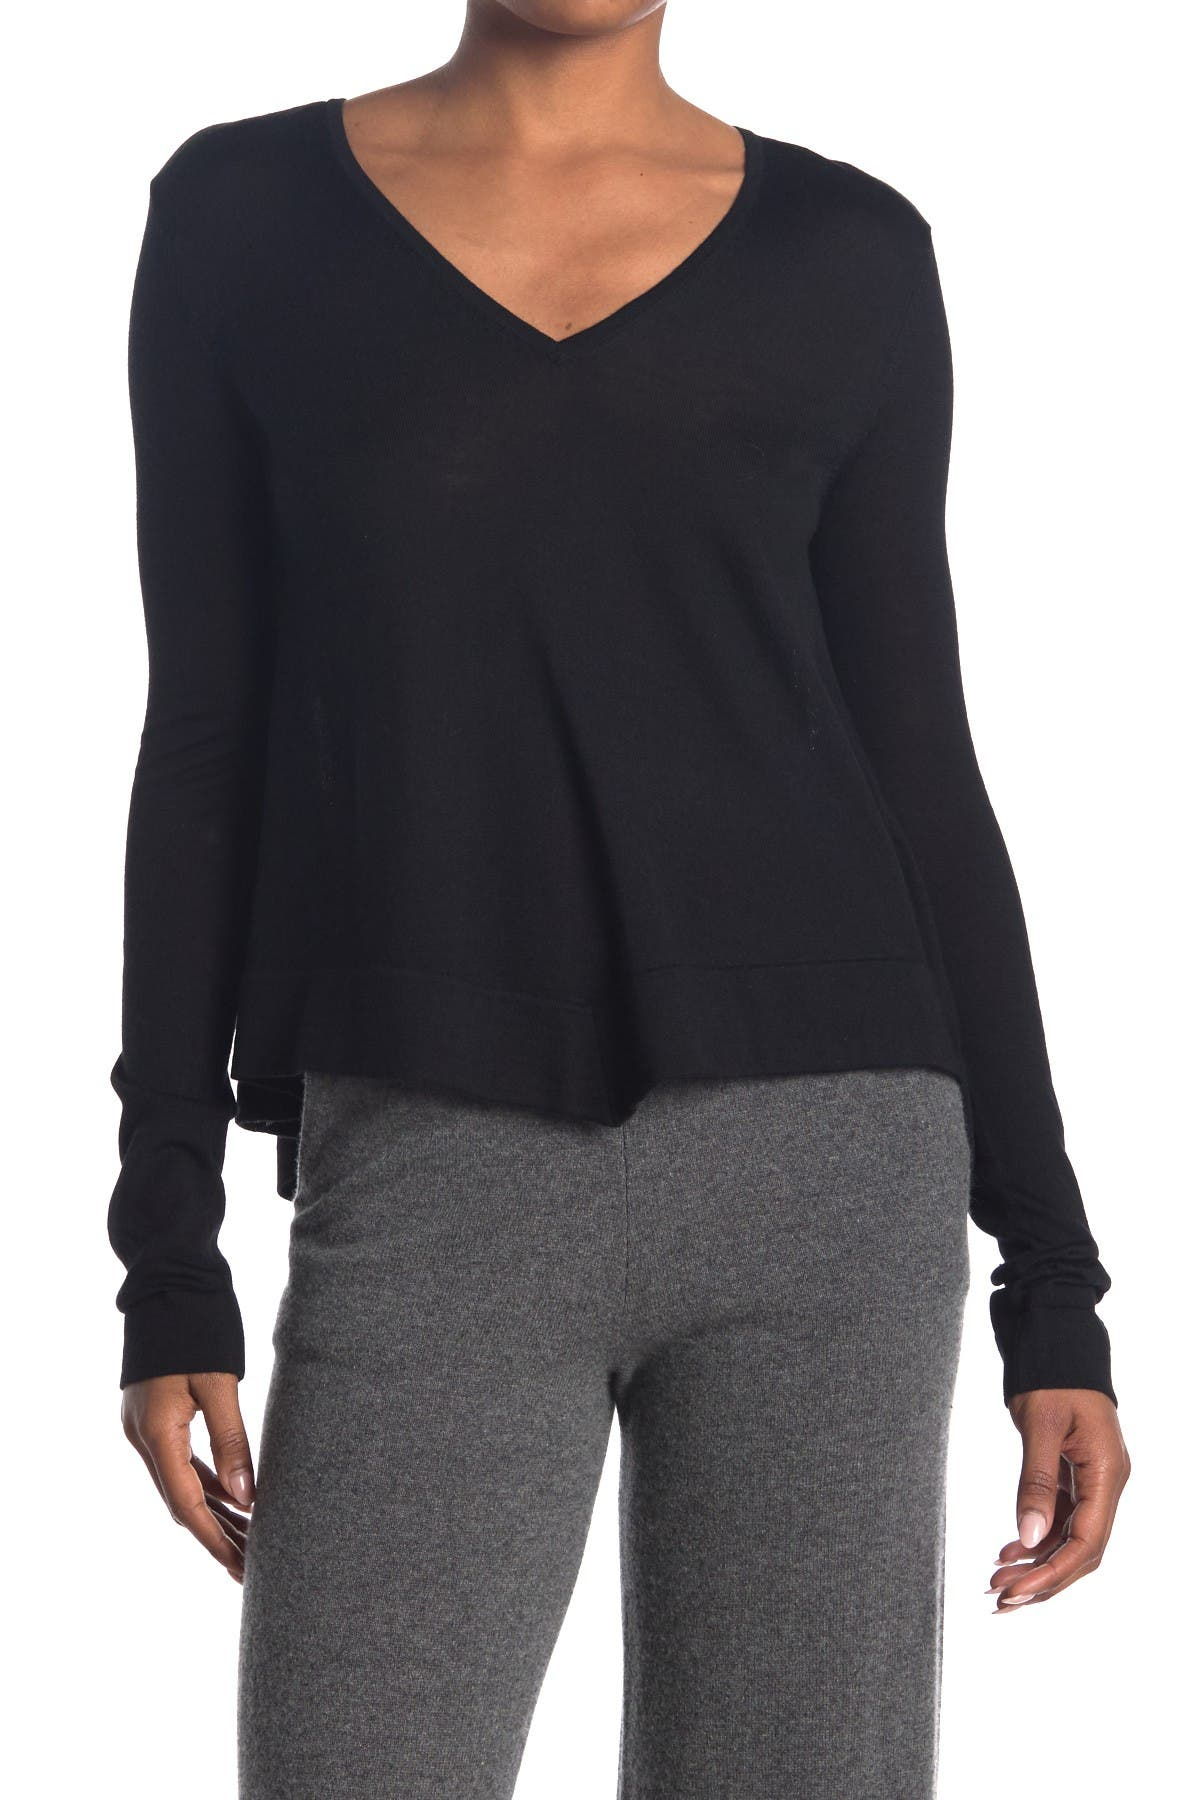 Image of DEREK LAM Ventura Wool Blend V-Neck Sweater